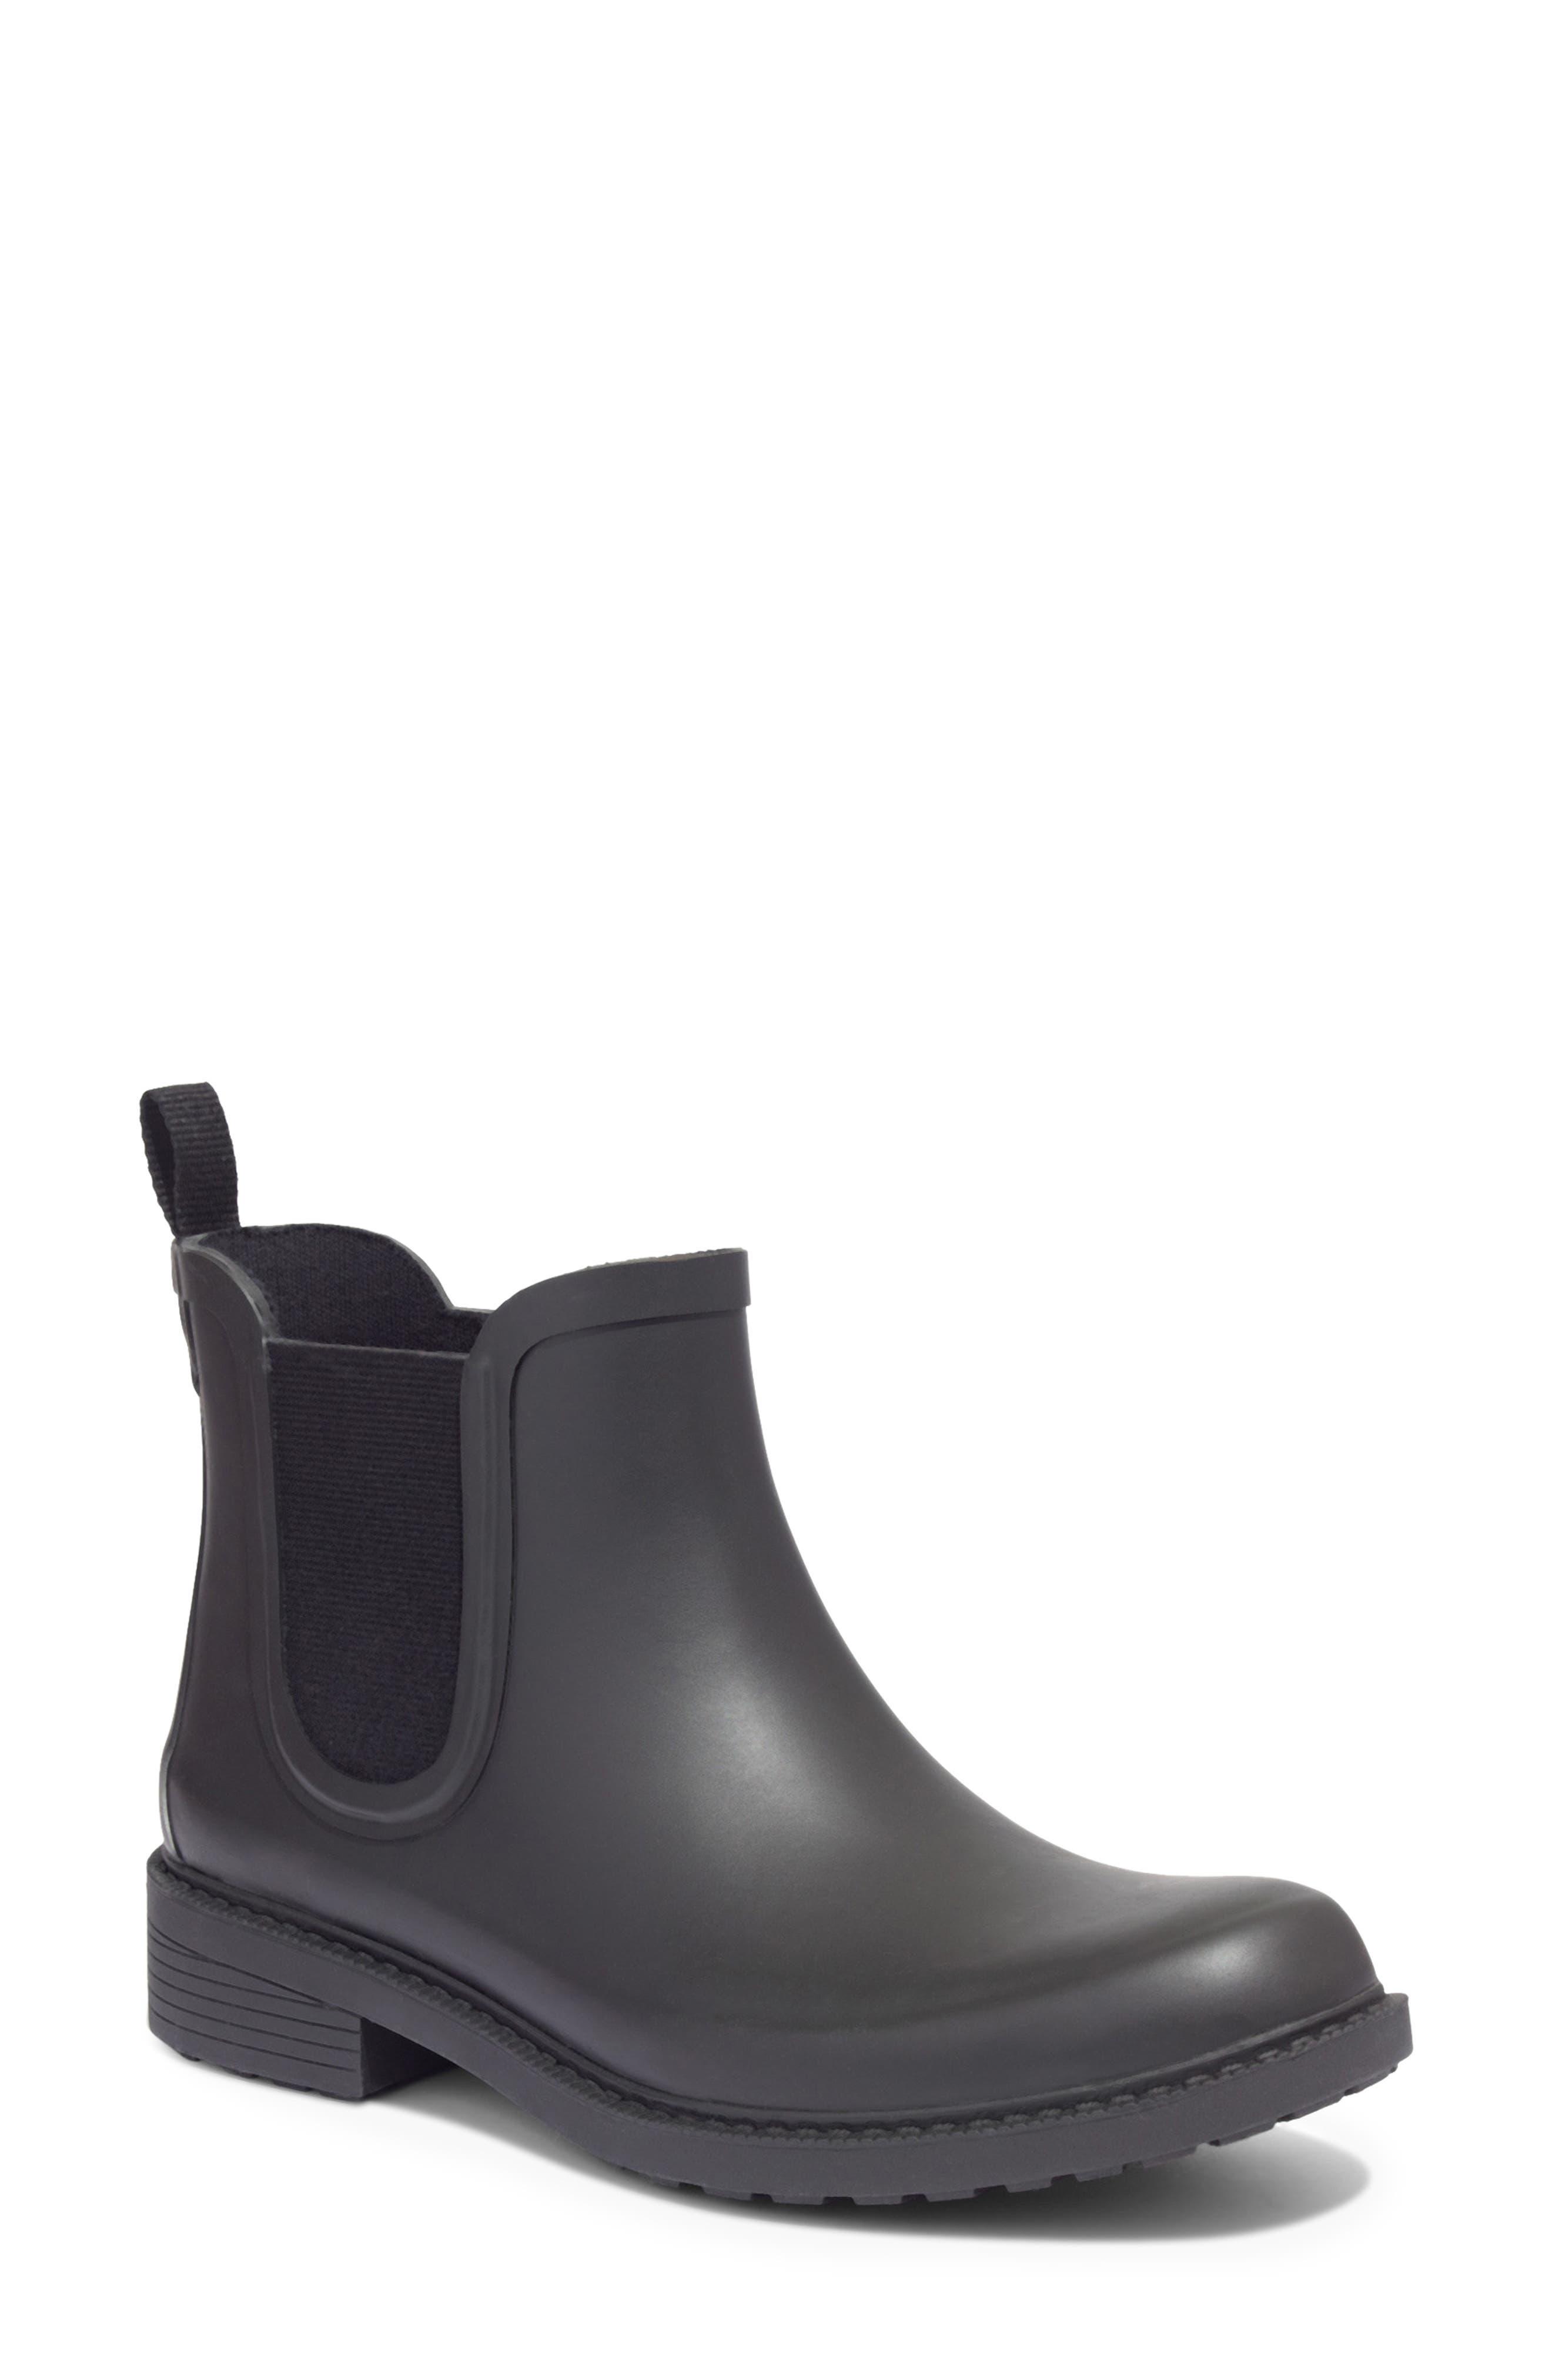 MADEWELL The Chelsea Rain Boot, Main, color, TRUE BLACK RUBBER